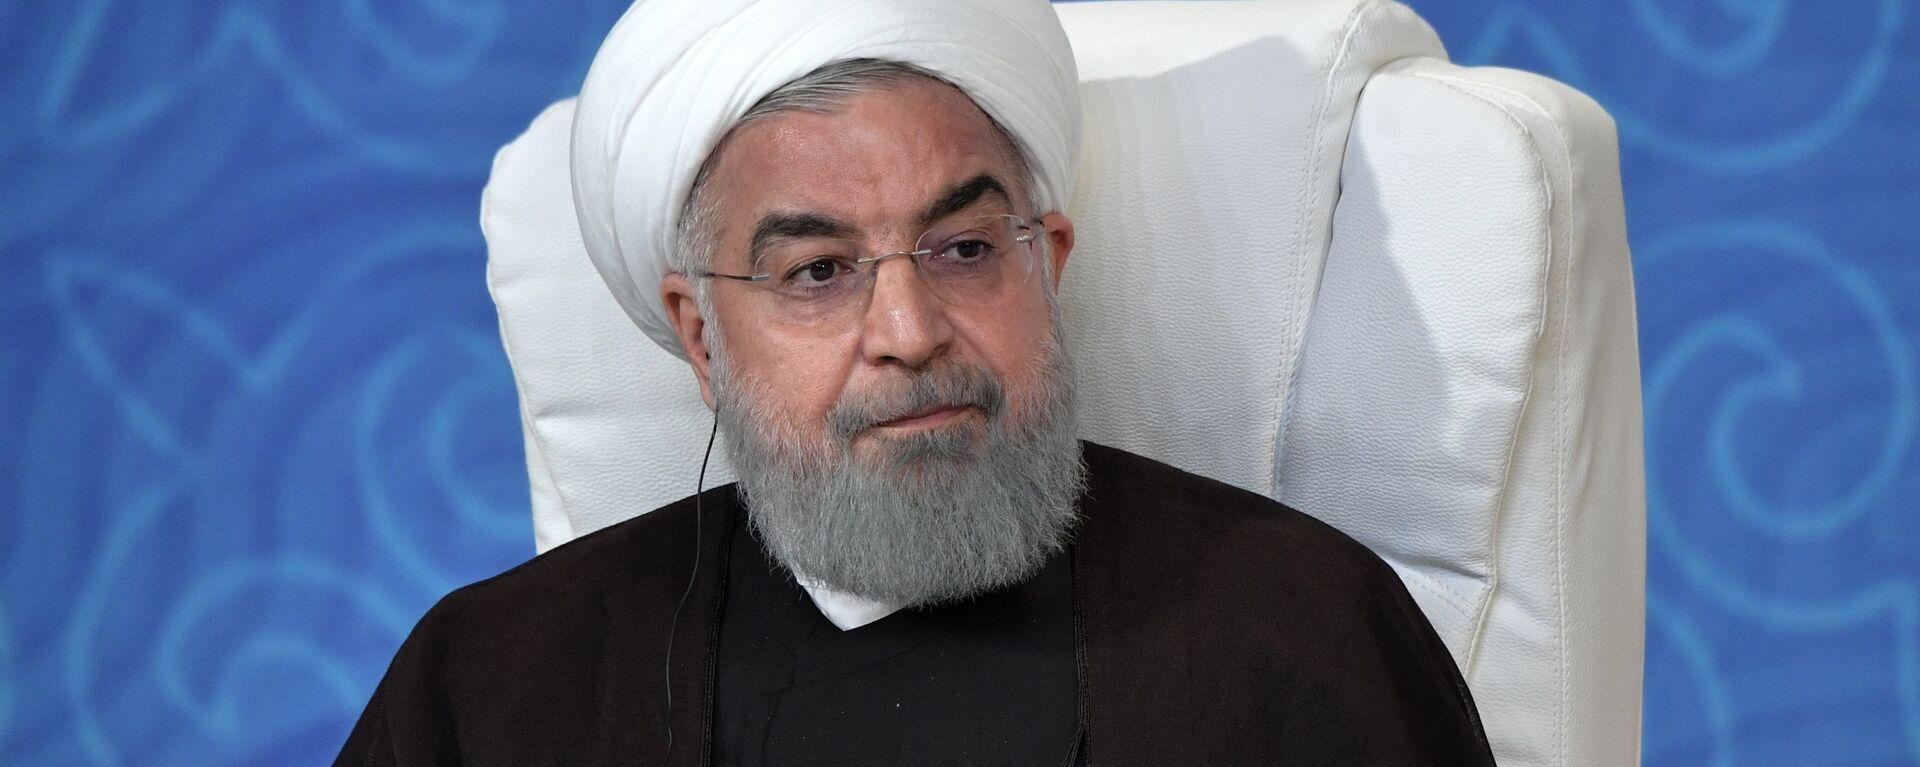 Hasán Rohaní, el presidente iraní - Sputnik Mundo, 1920, 10.06.2021